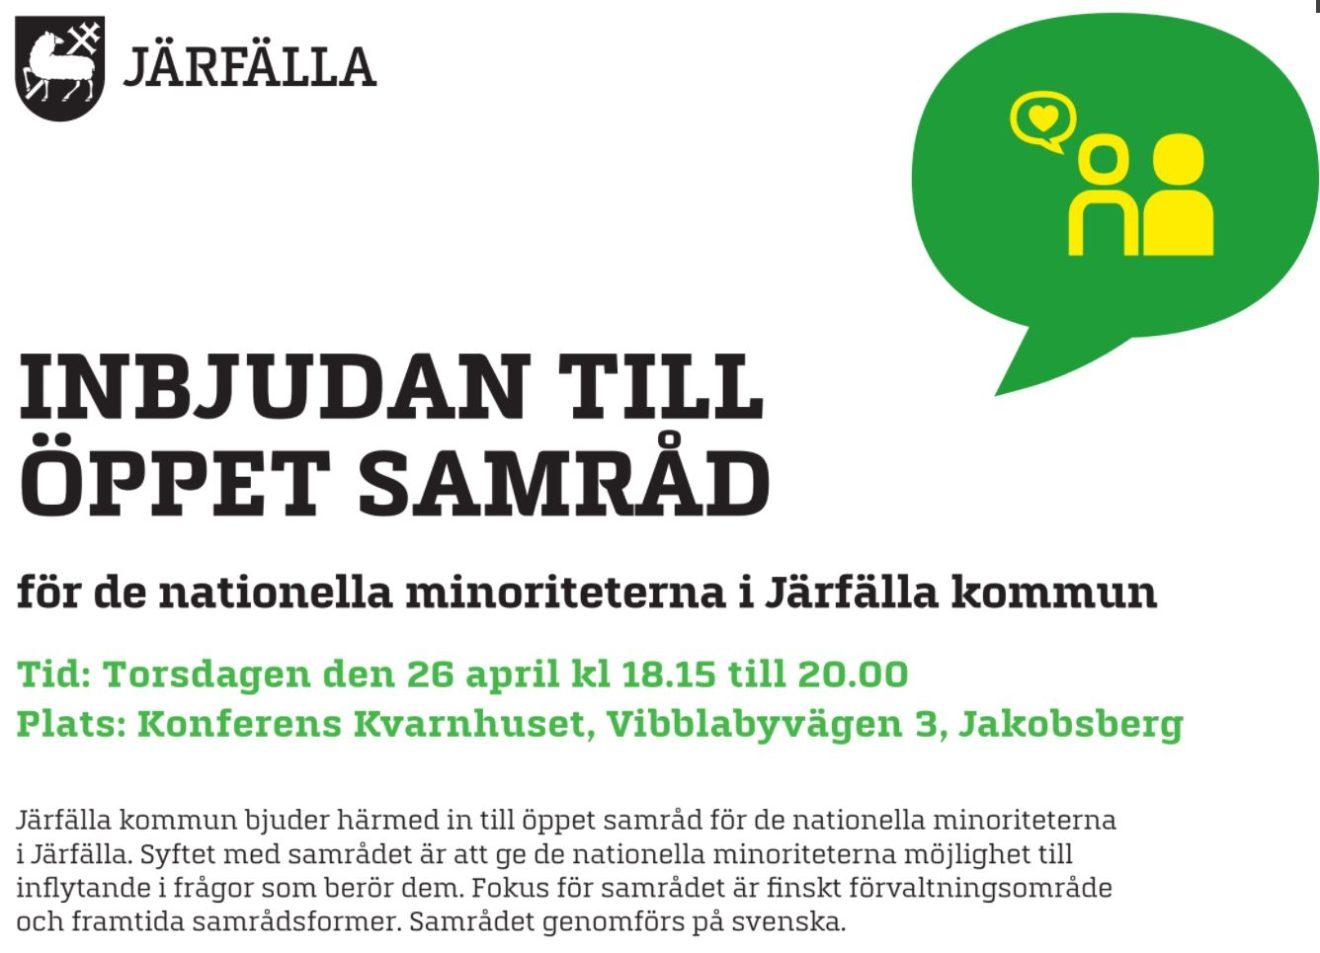 Öppet samråd i Järfälla - 26 april